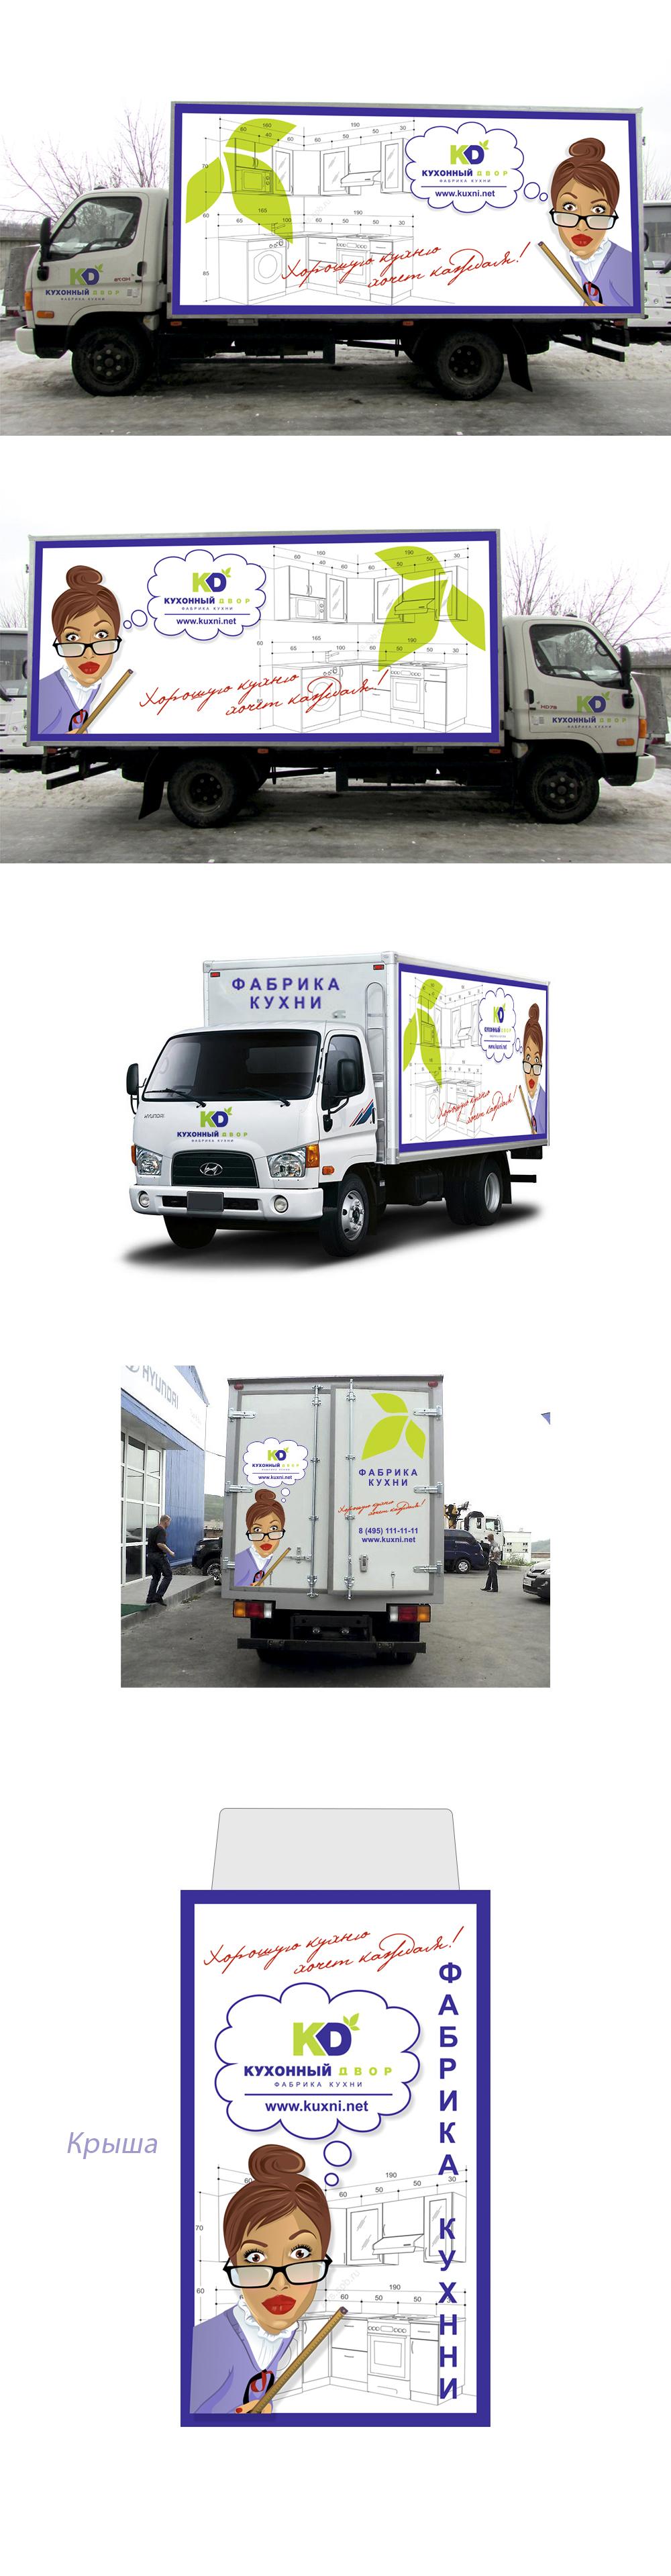 "Брендирование грузового авто для компании ""Кухонный двор"" фото f_66559bc23ecb6534.jpg"